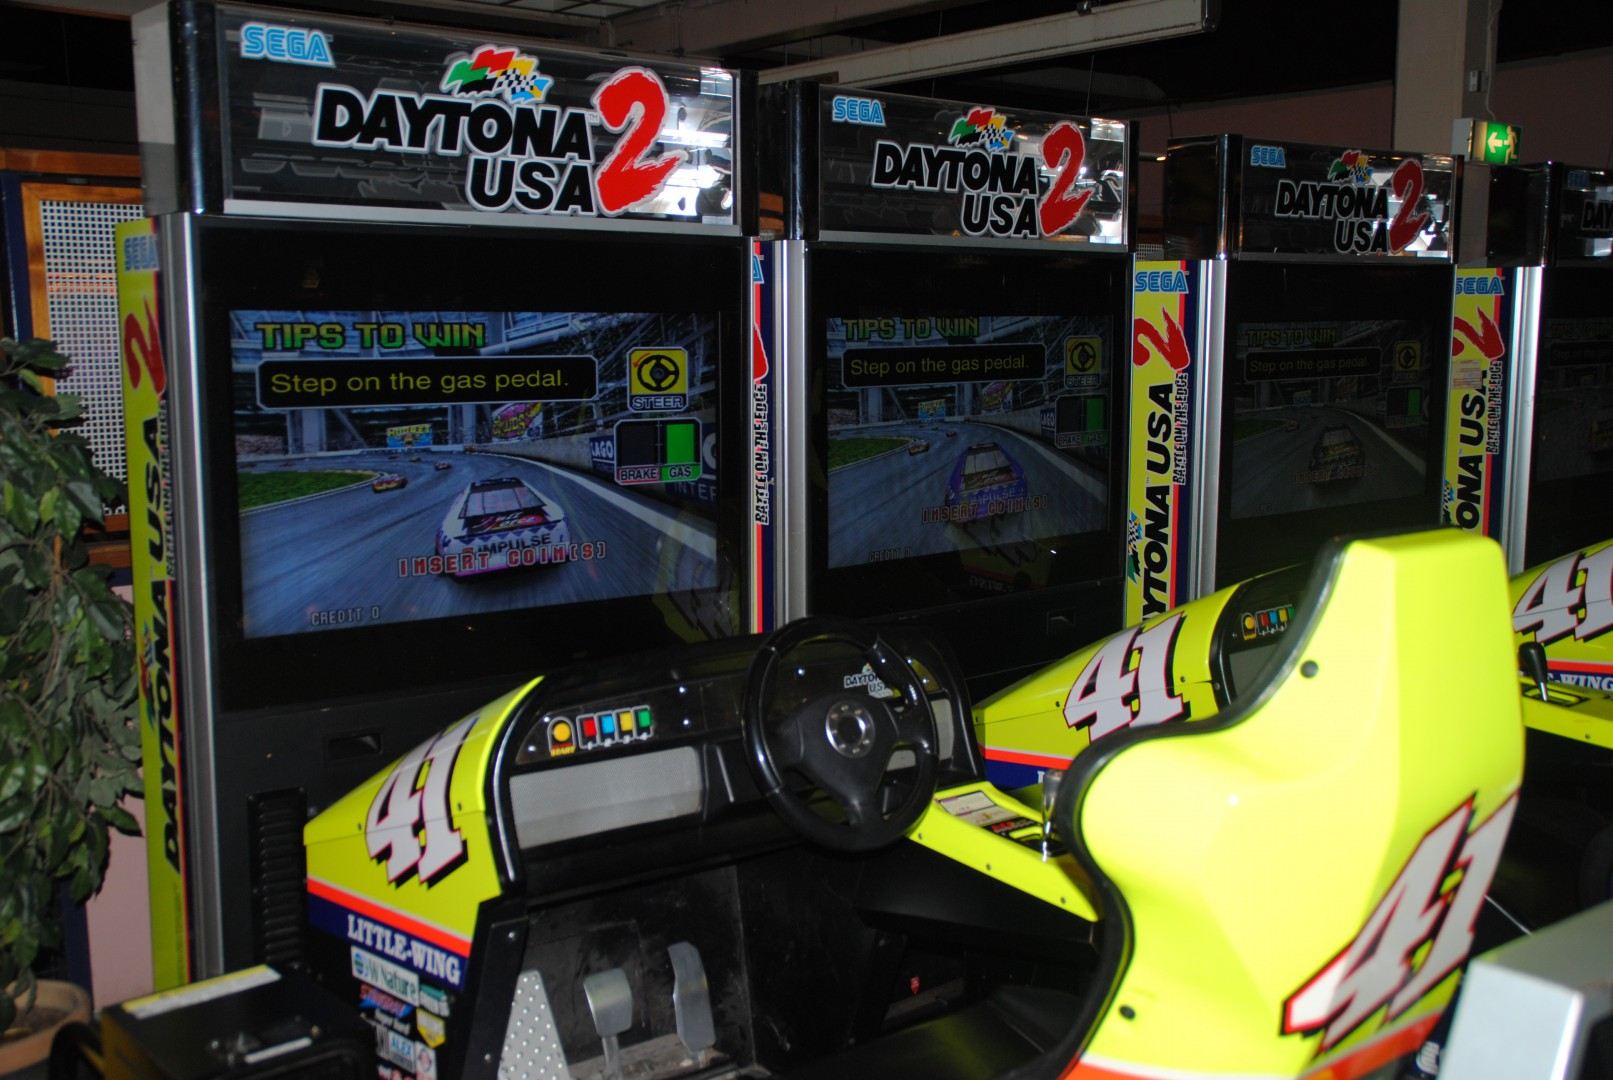 Daytona USA 2 / At Liseberg Fun Fair